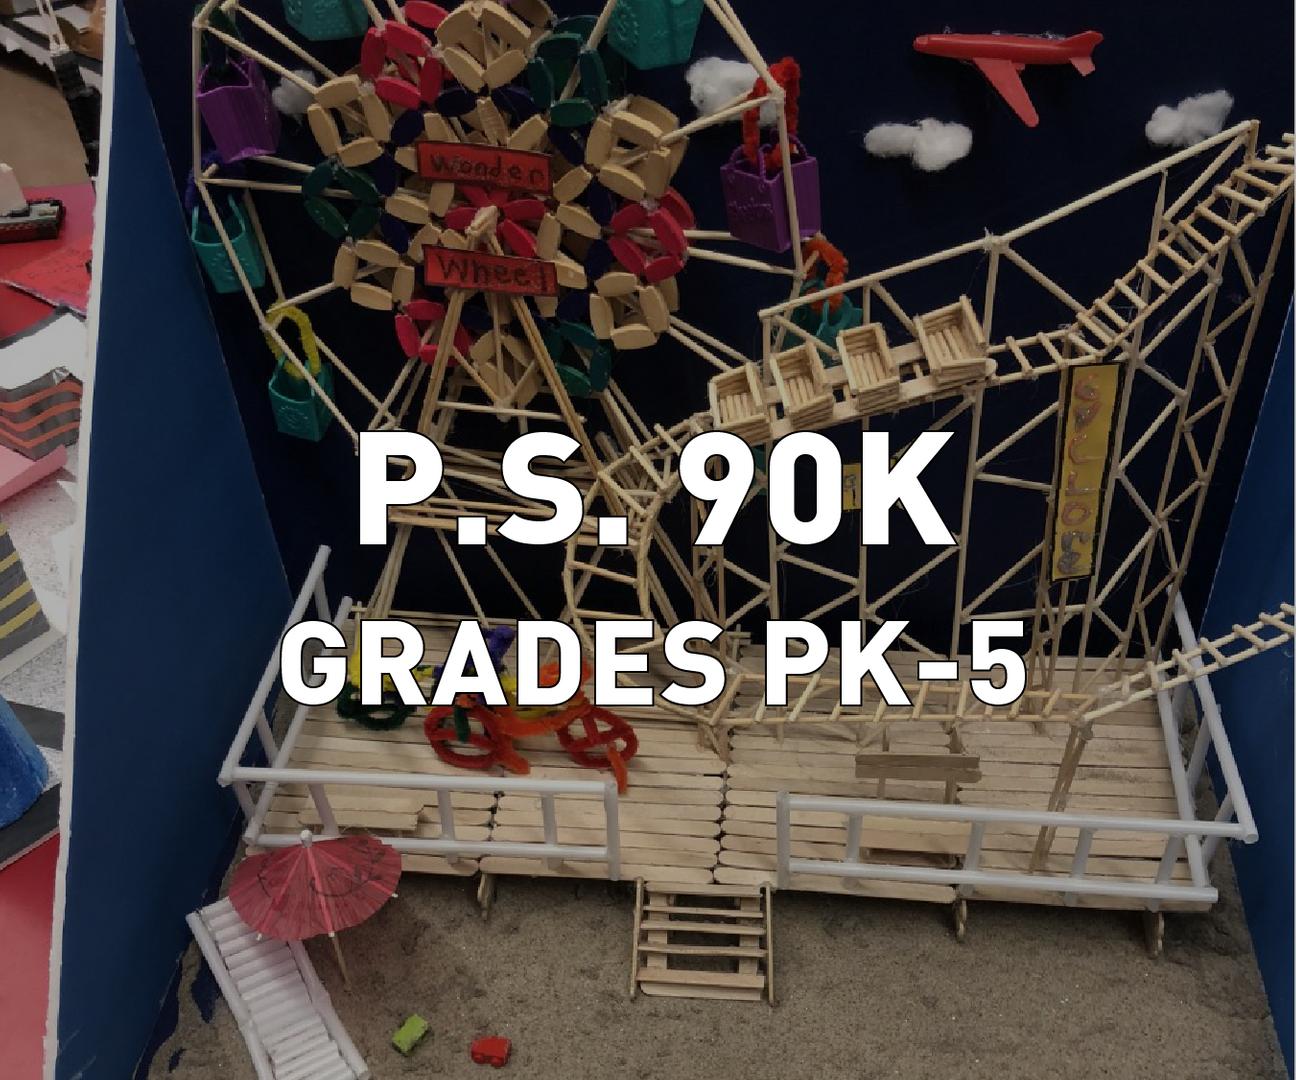 P.S. 90K Grades PK-5